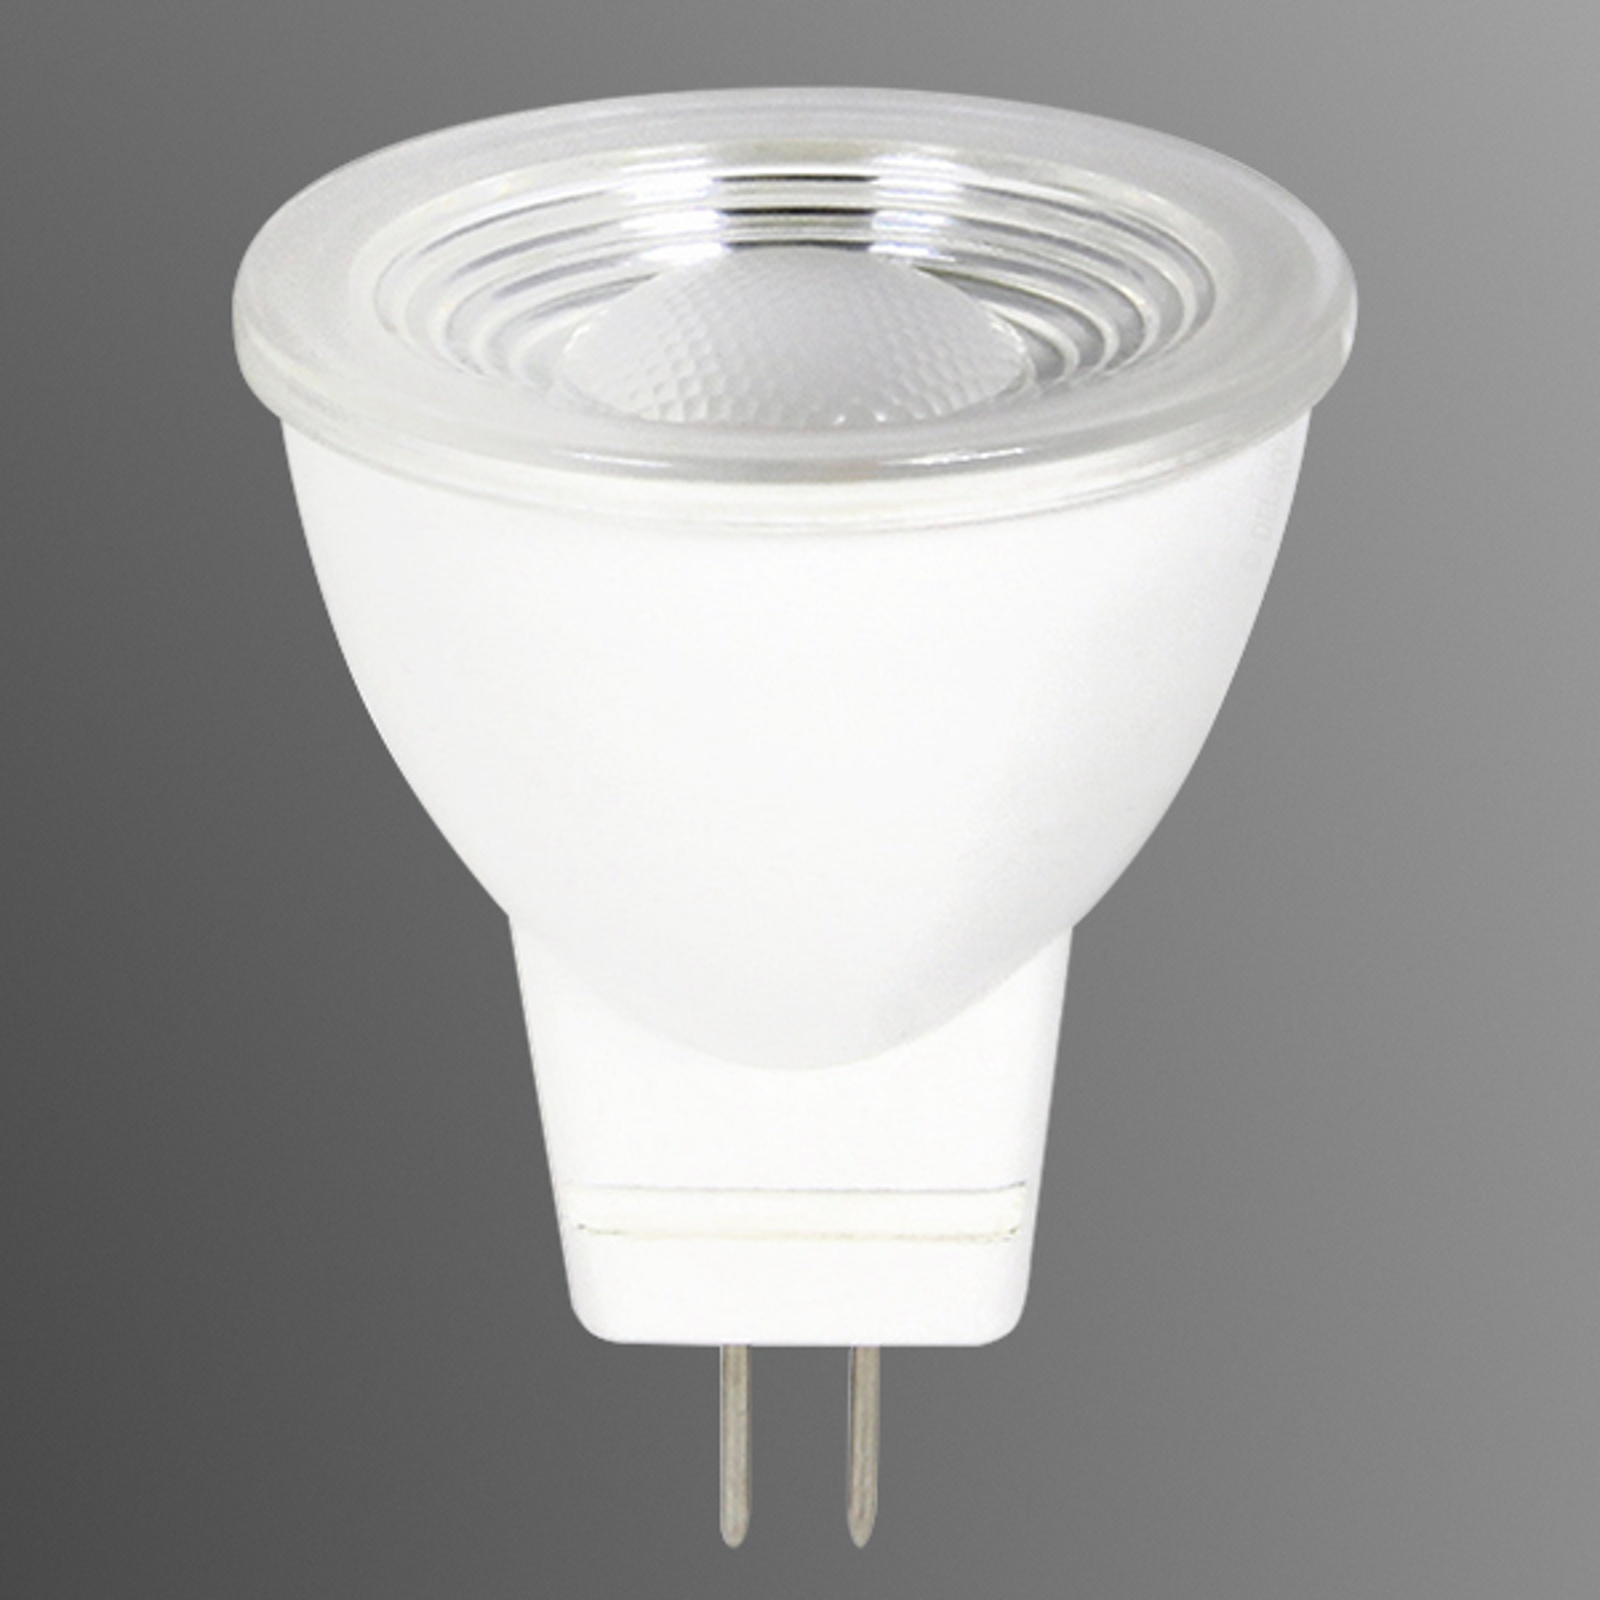 GU4 MR11 4W 830 reflektor LED HELSO 60°